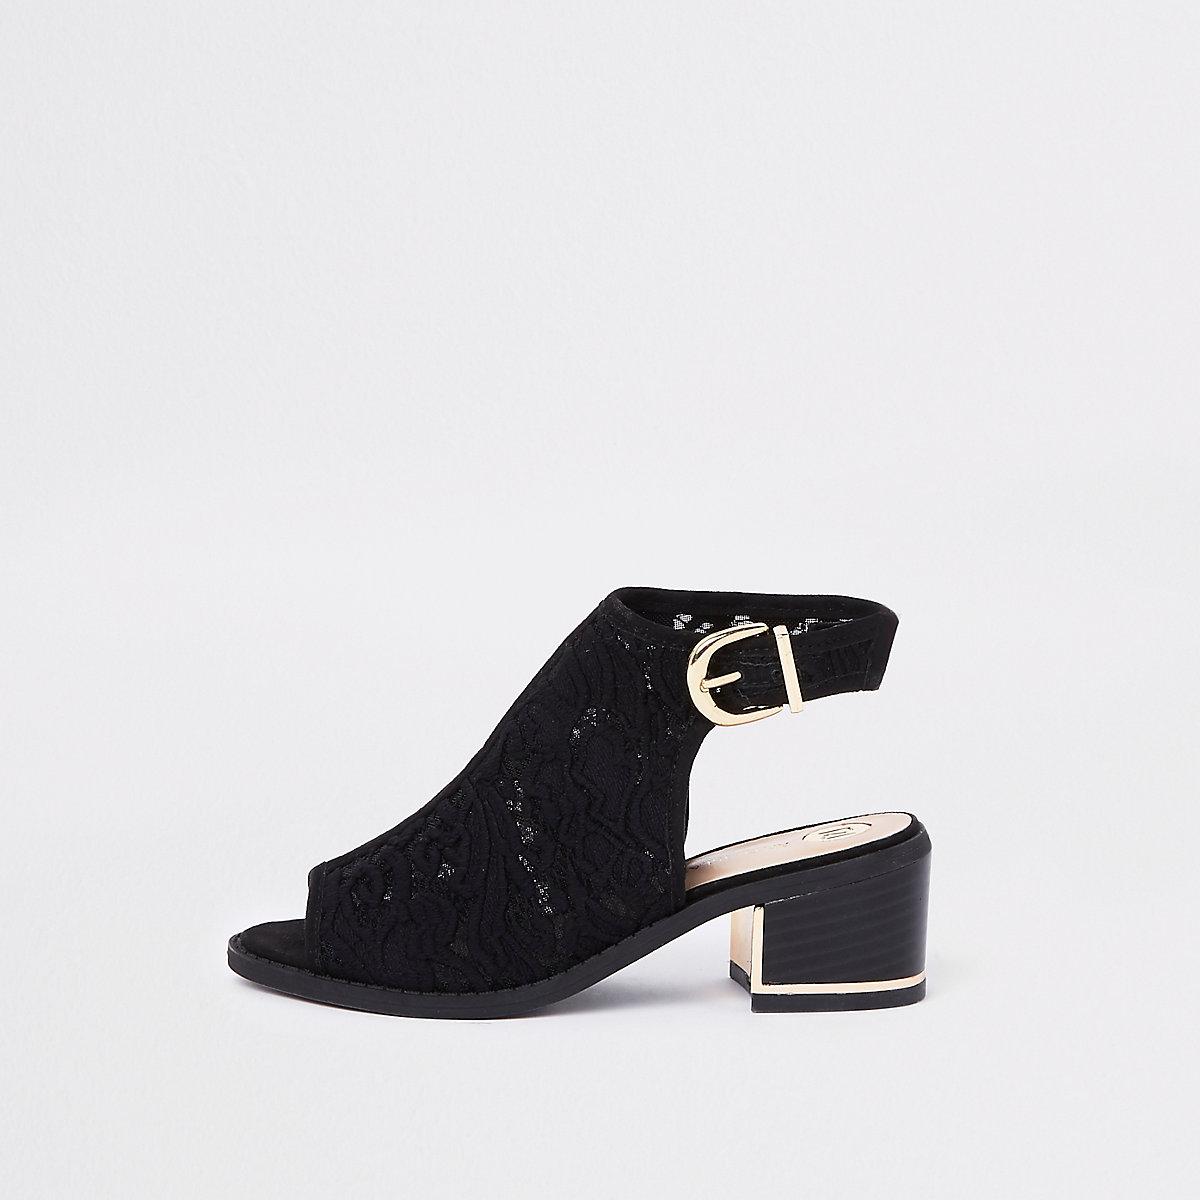 Girls black lace peep toe heels